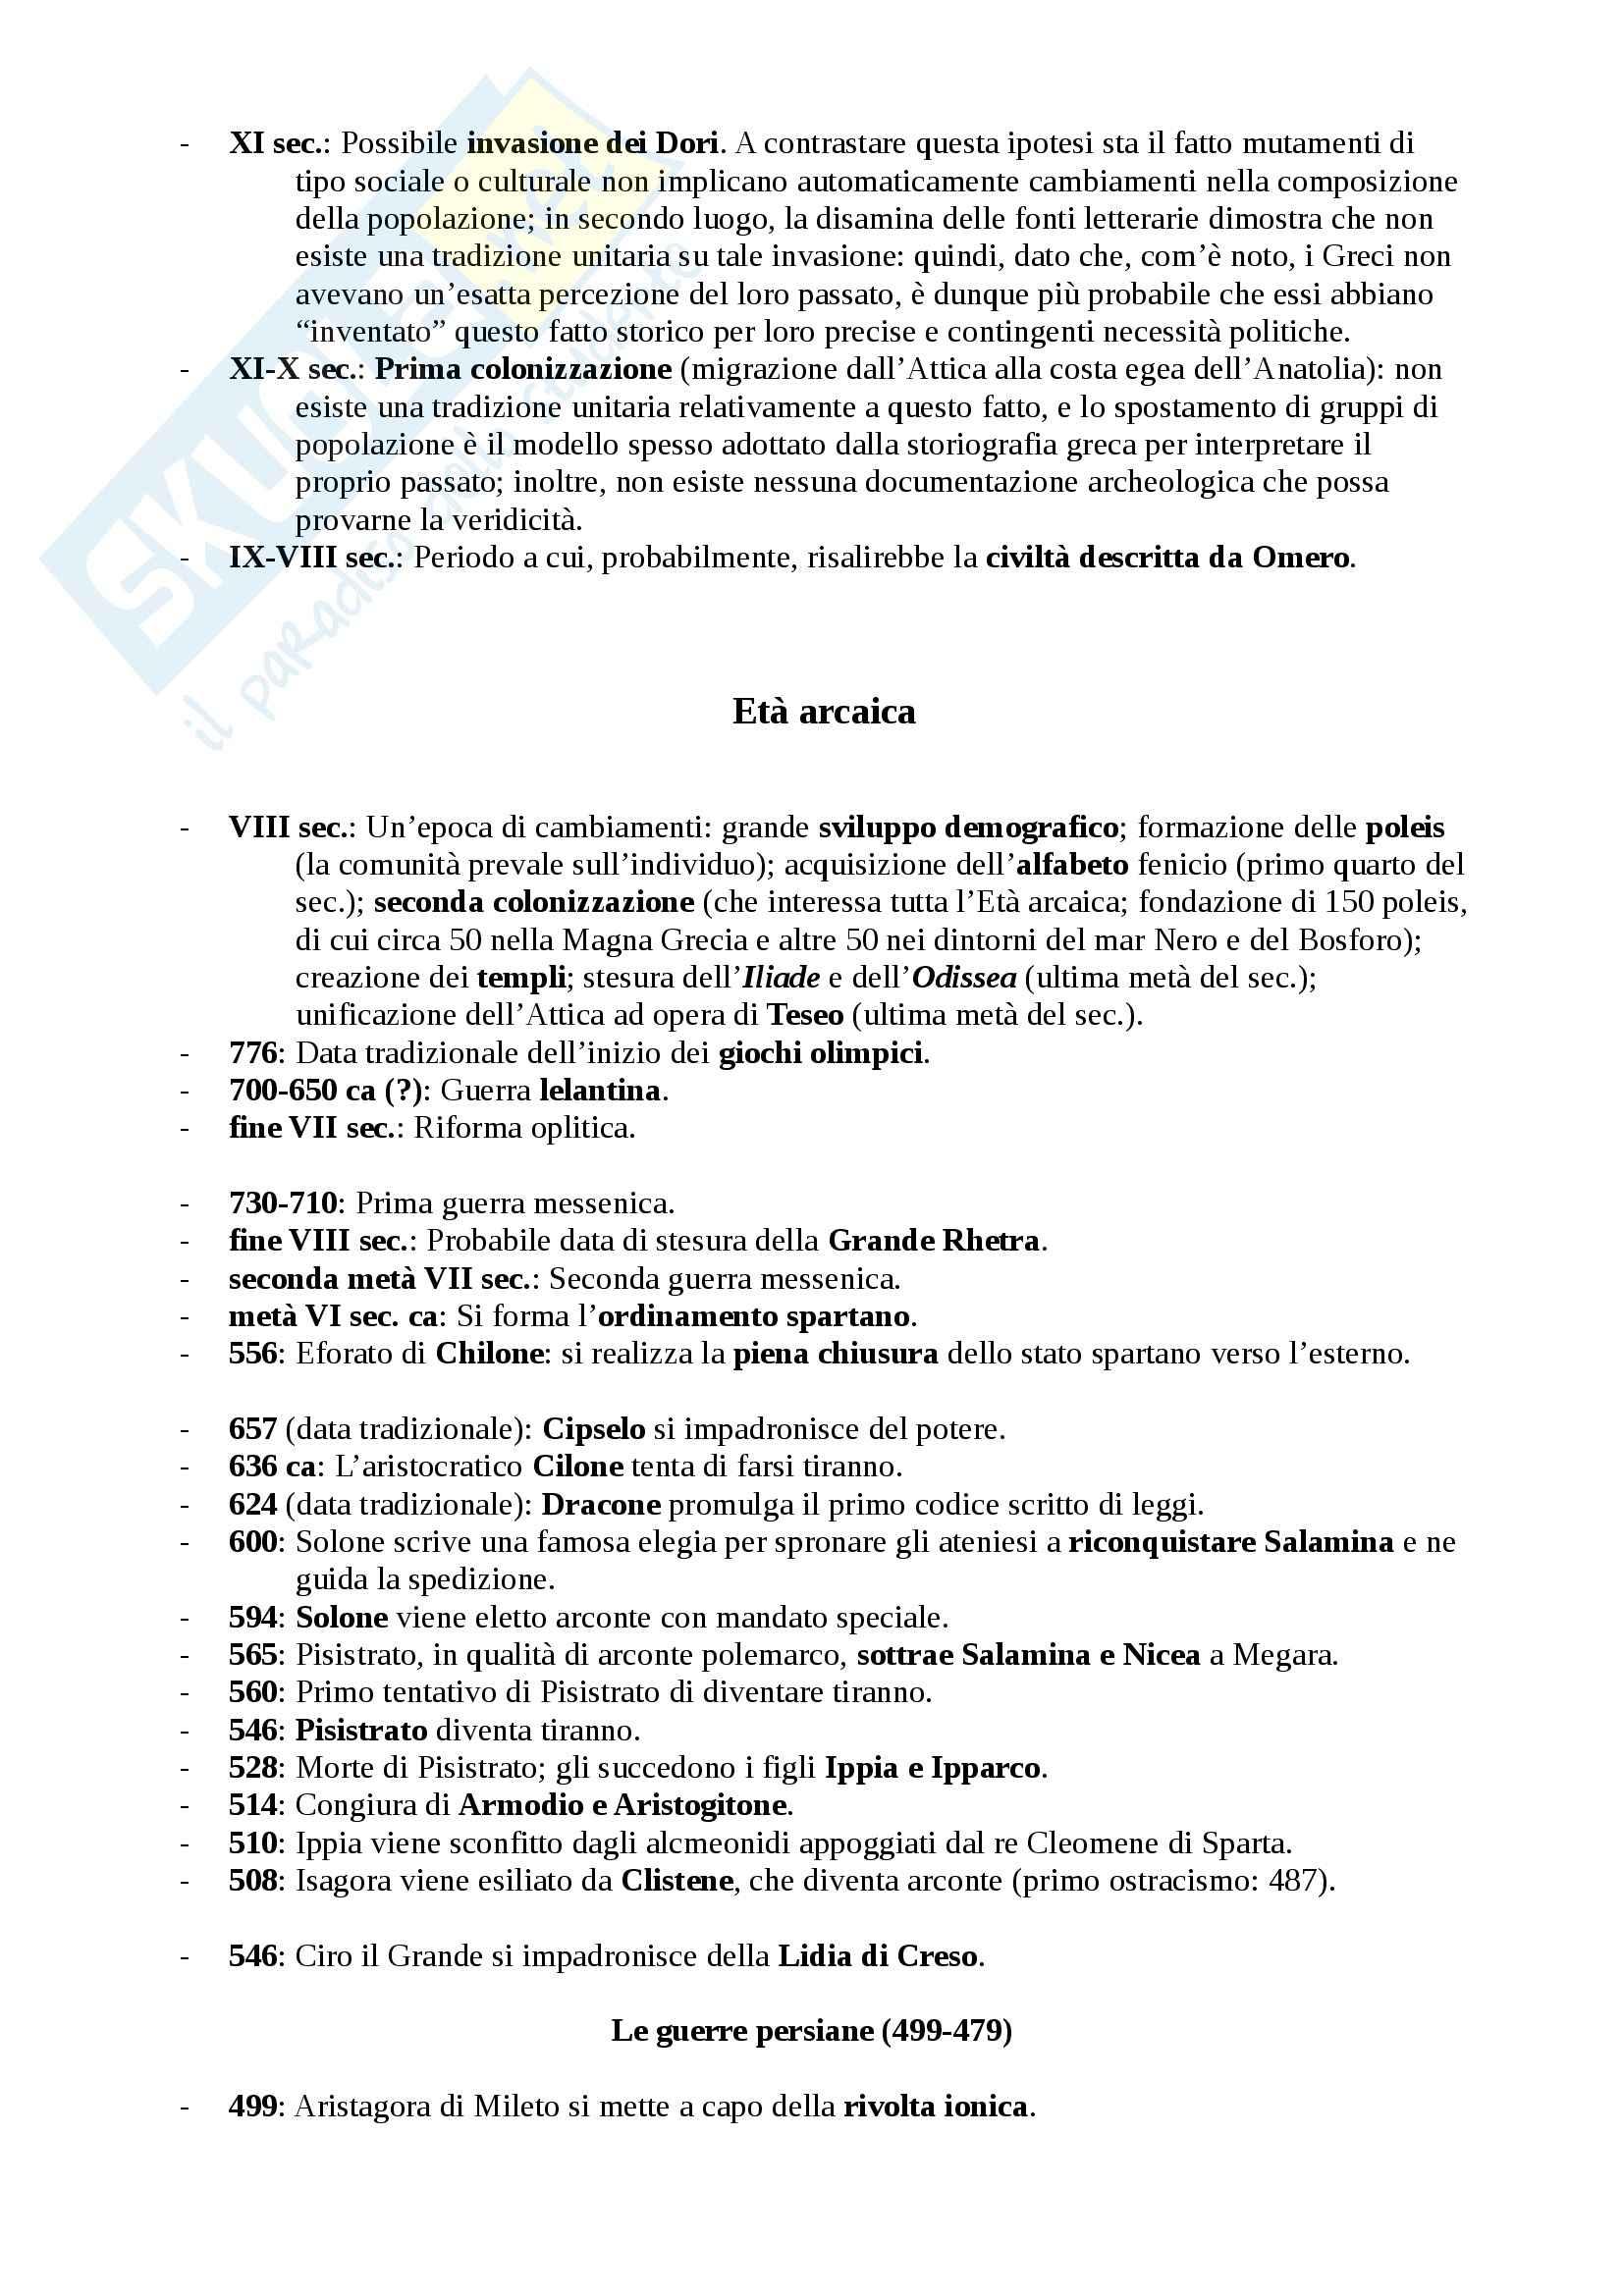 Storia greca - Cronologia Pag. 2